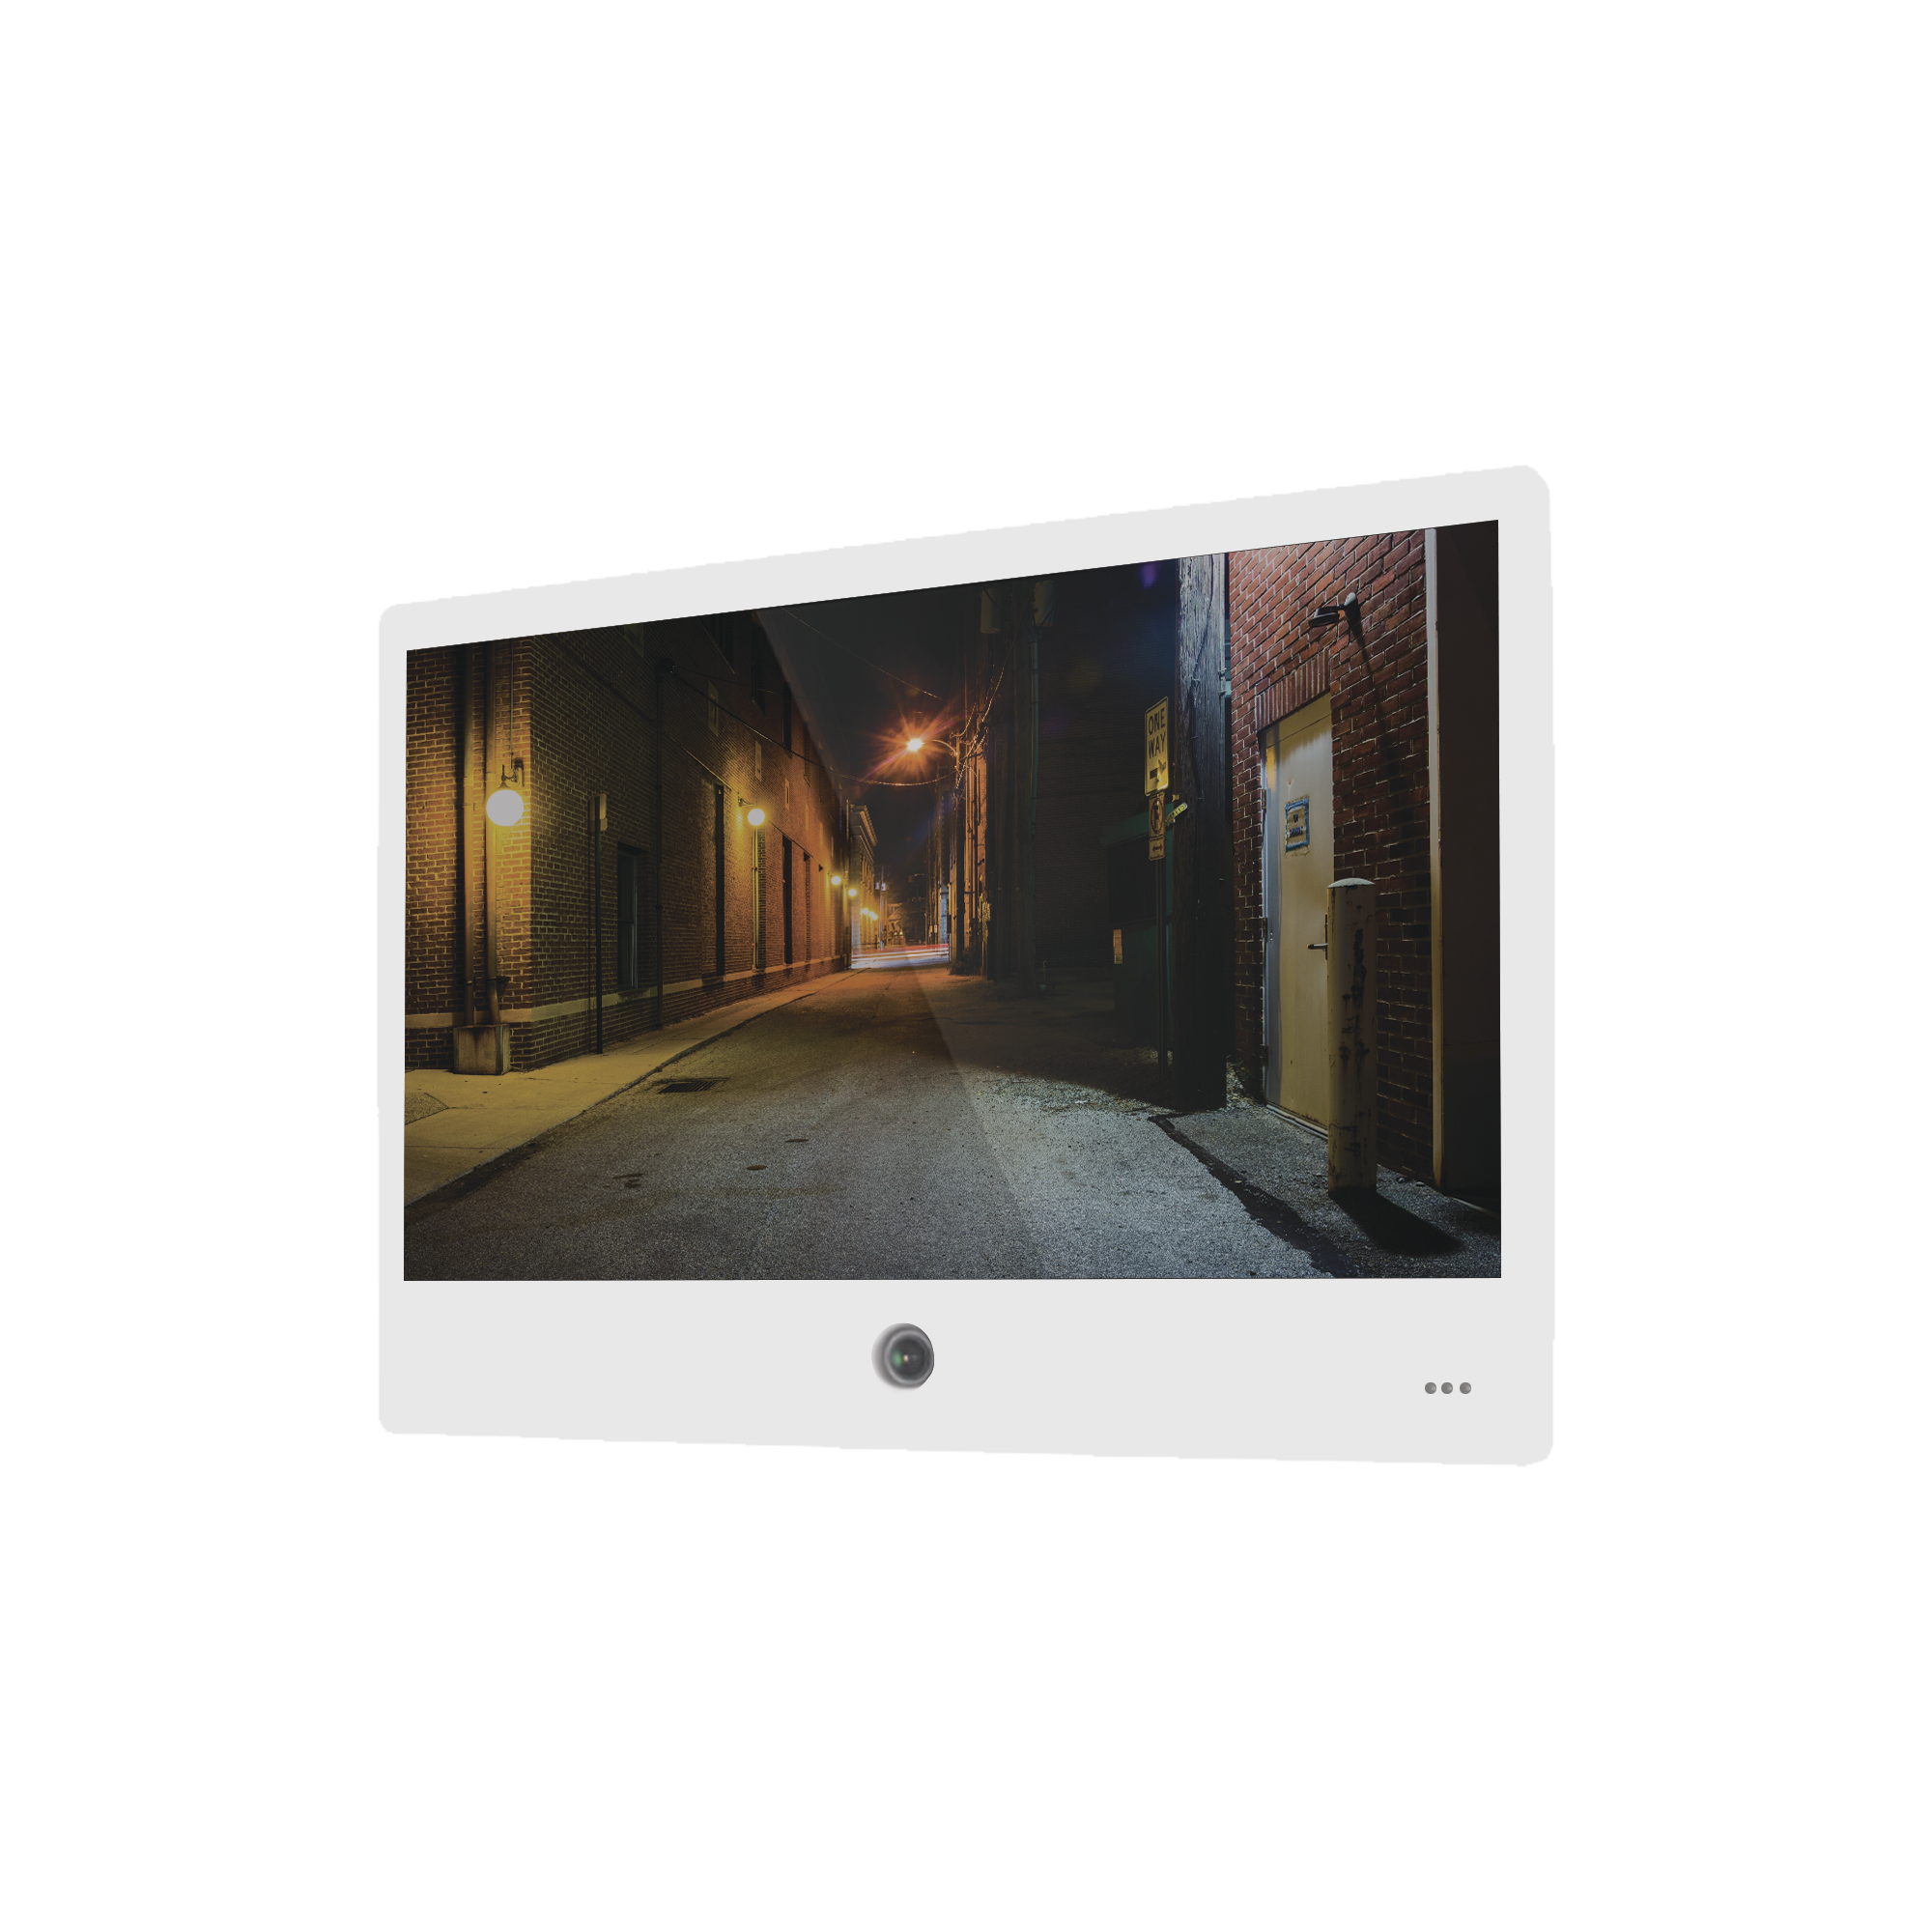 Monitor de Vista Publica de 21.5 Cámara 2 Megapixel Integrada (Color Blanco)